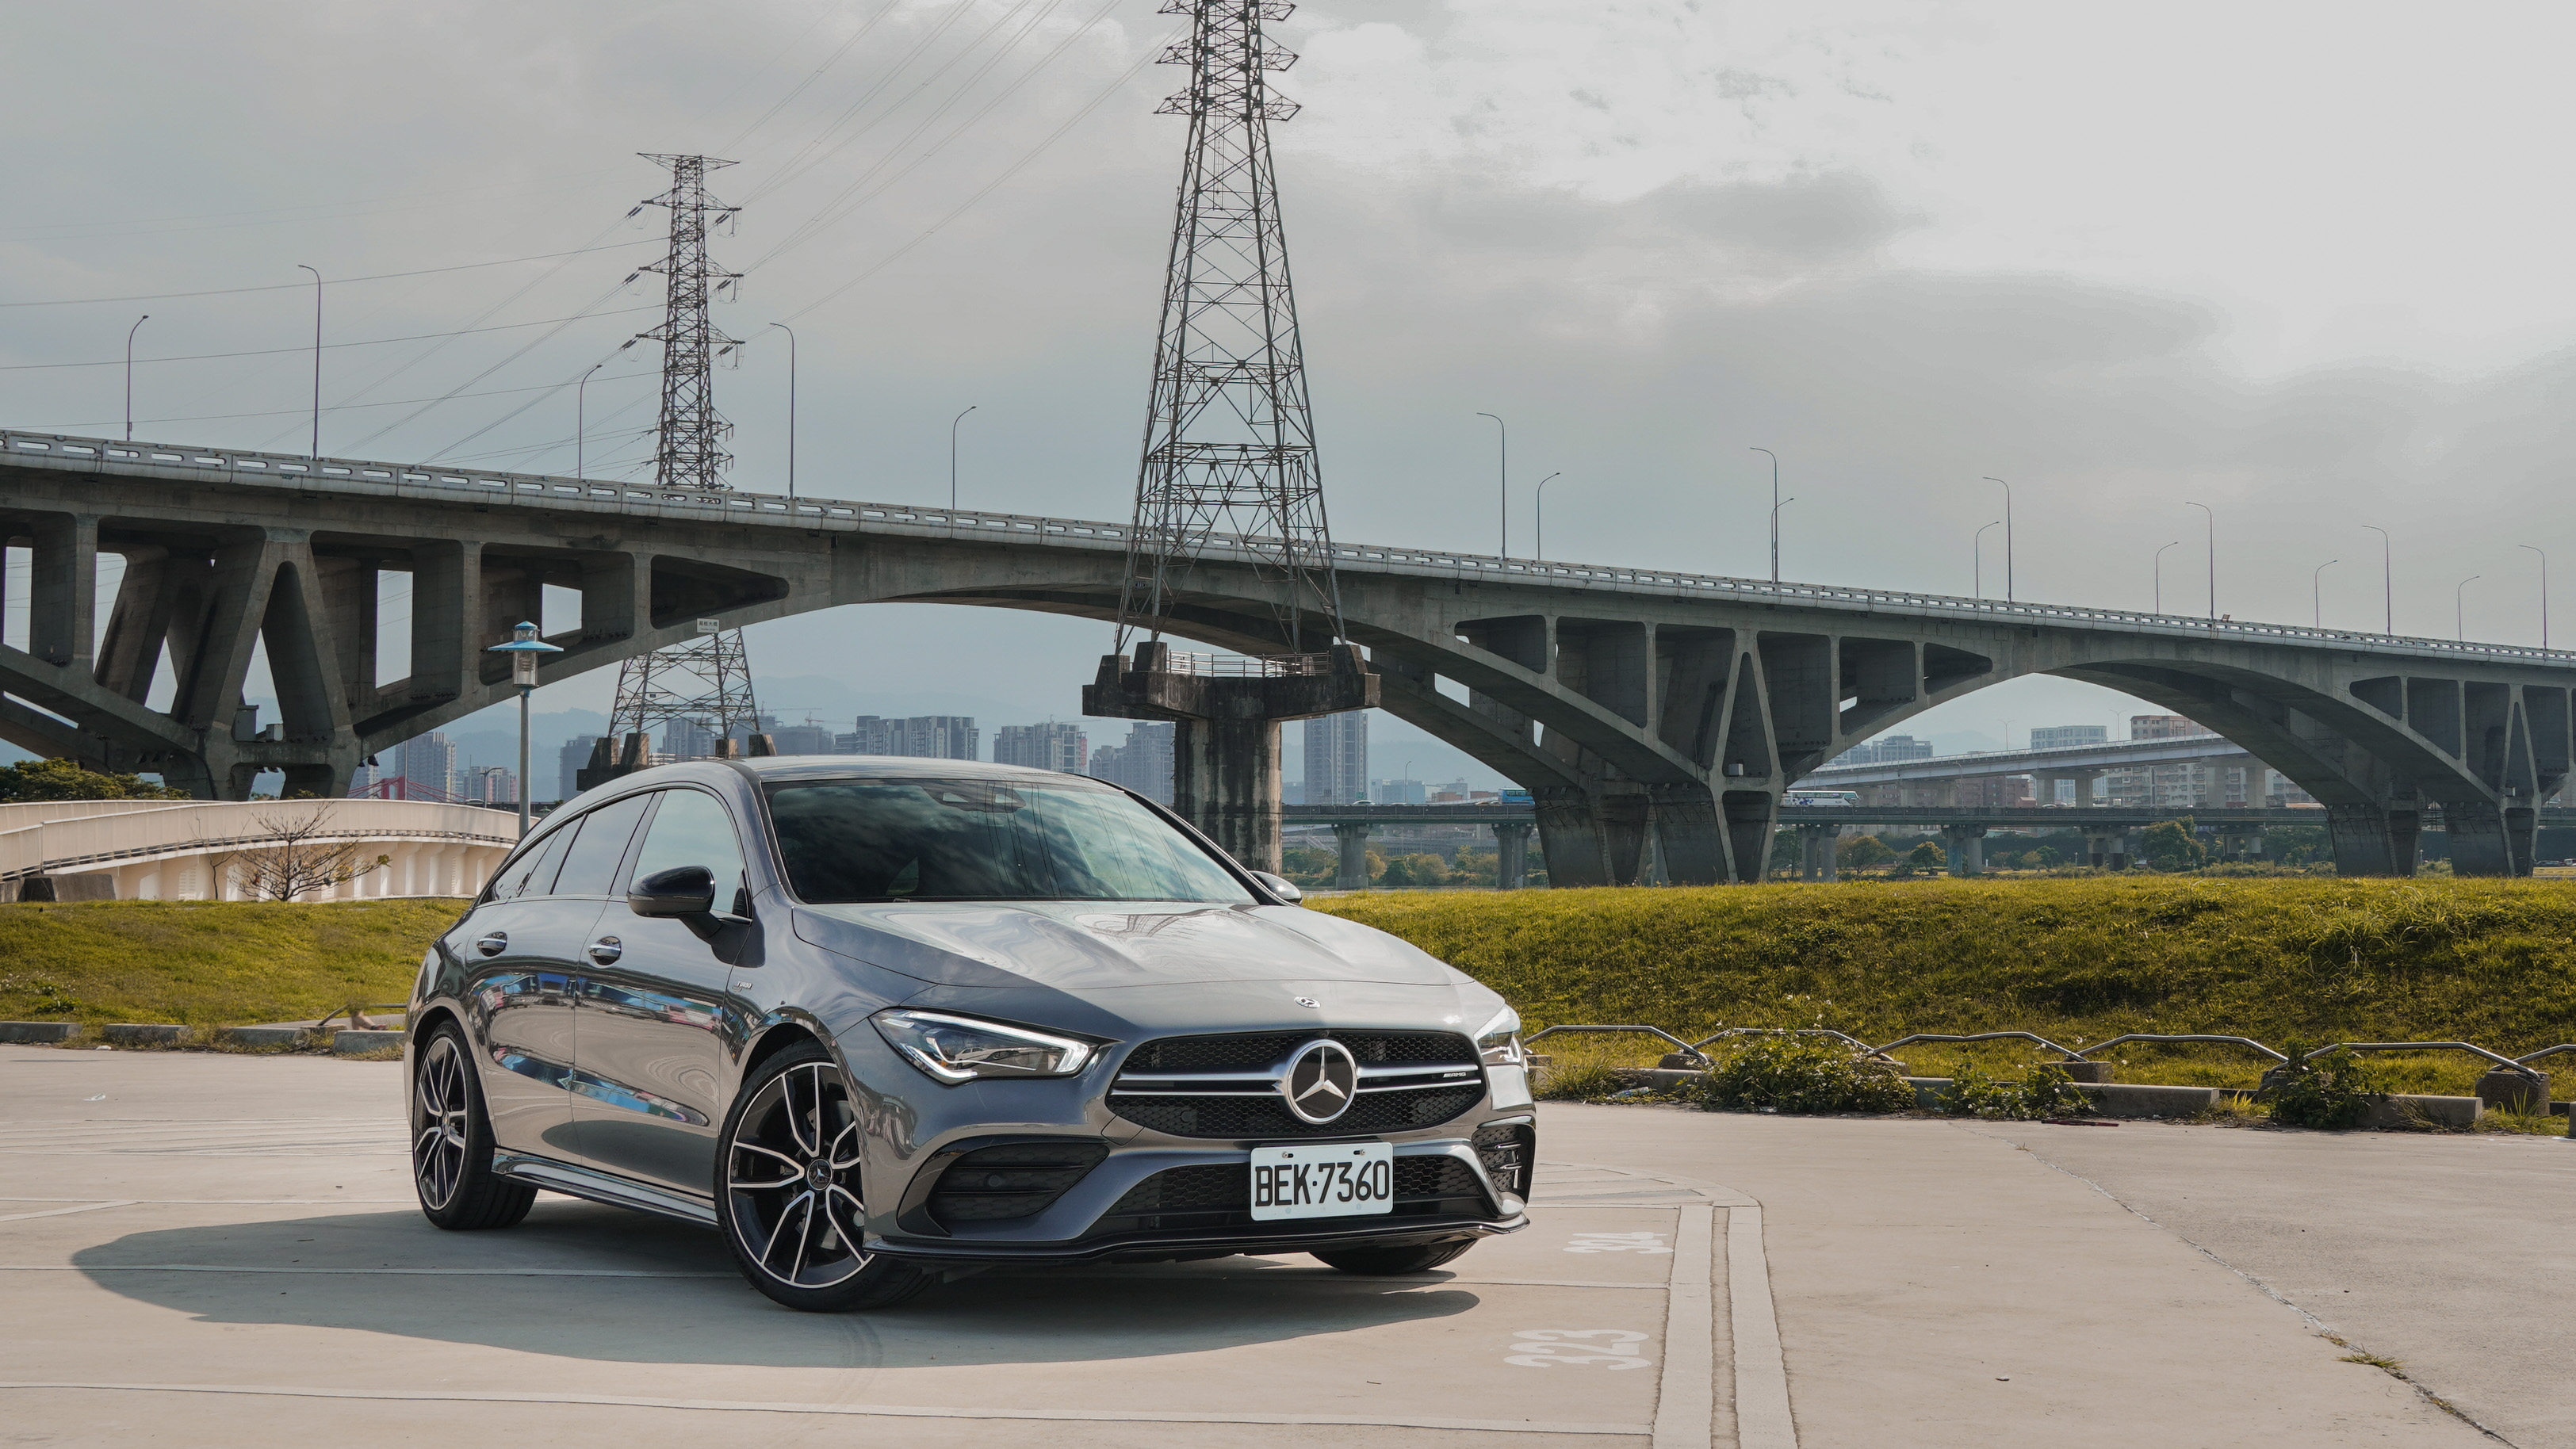 Mercedes-AMG CLA 35 4MATIC Shooting Brake 售價 276 萬元起。